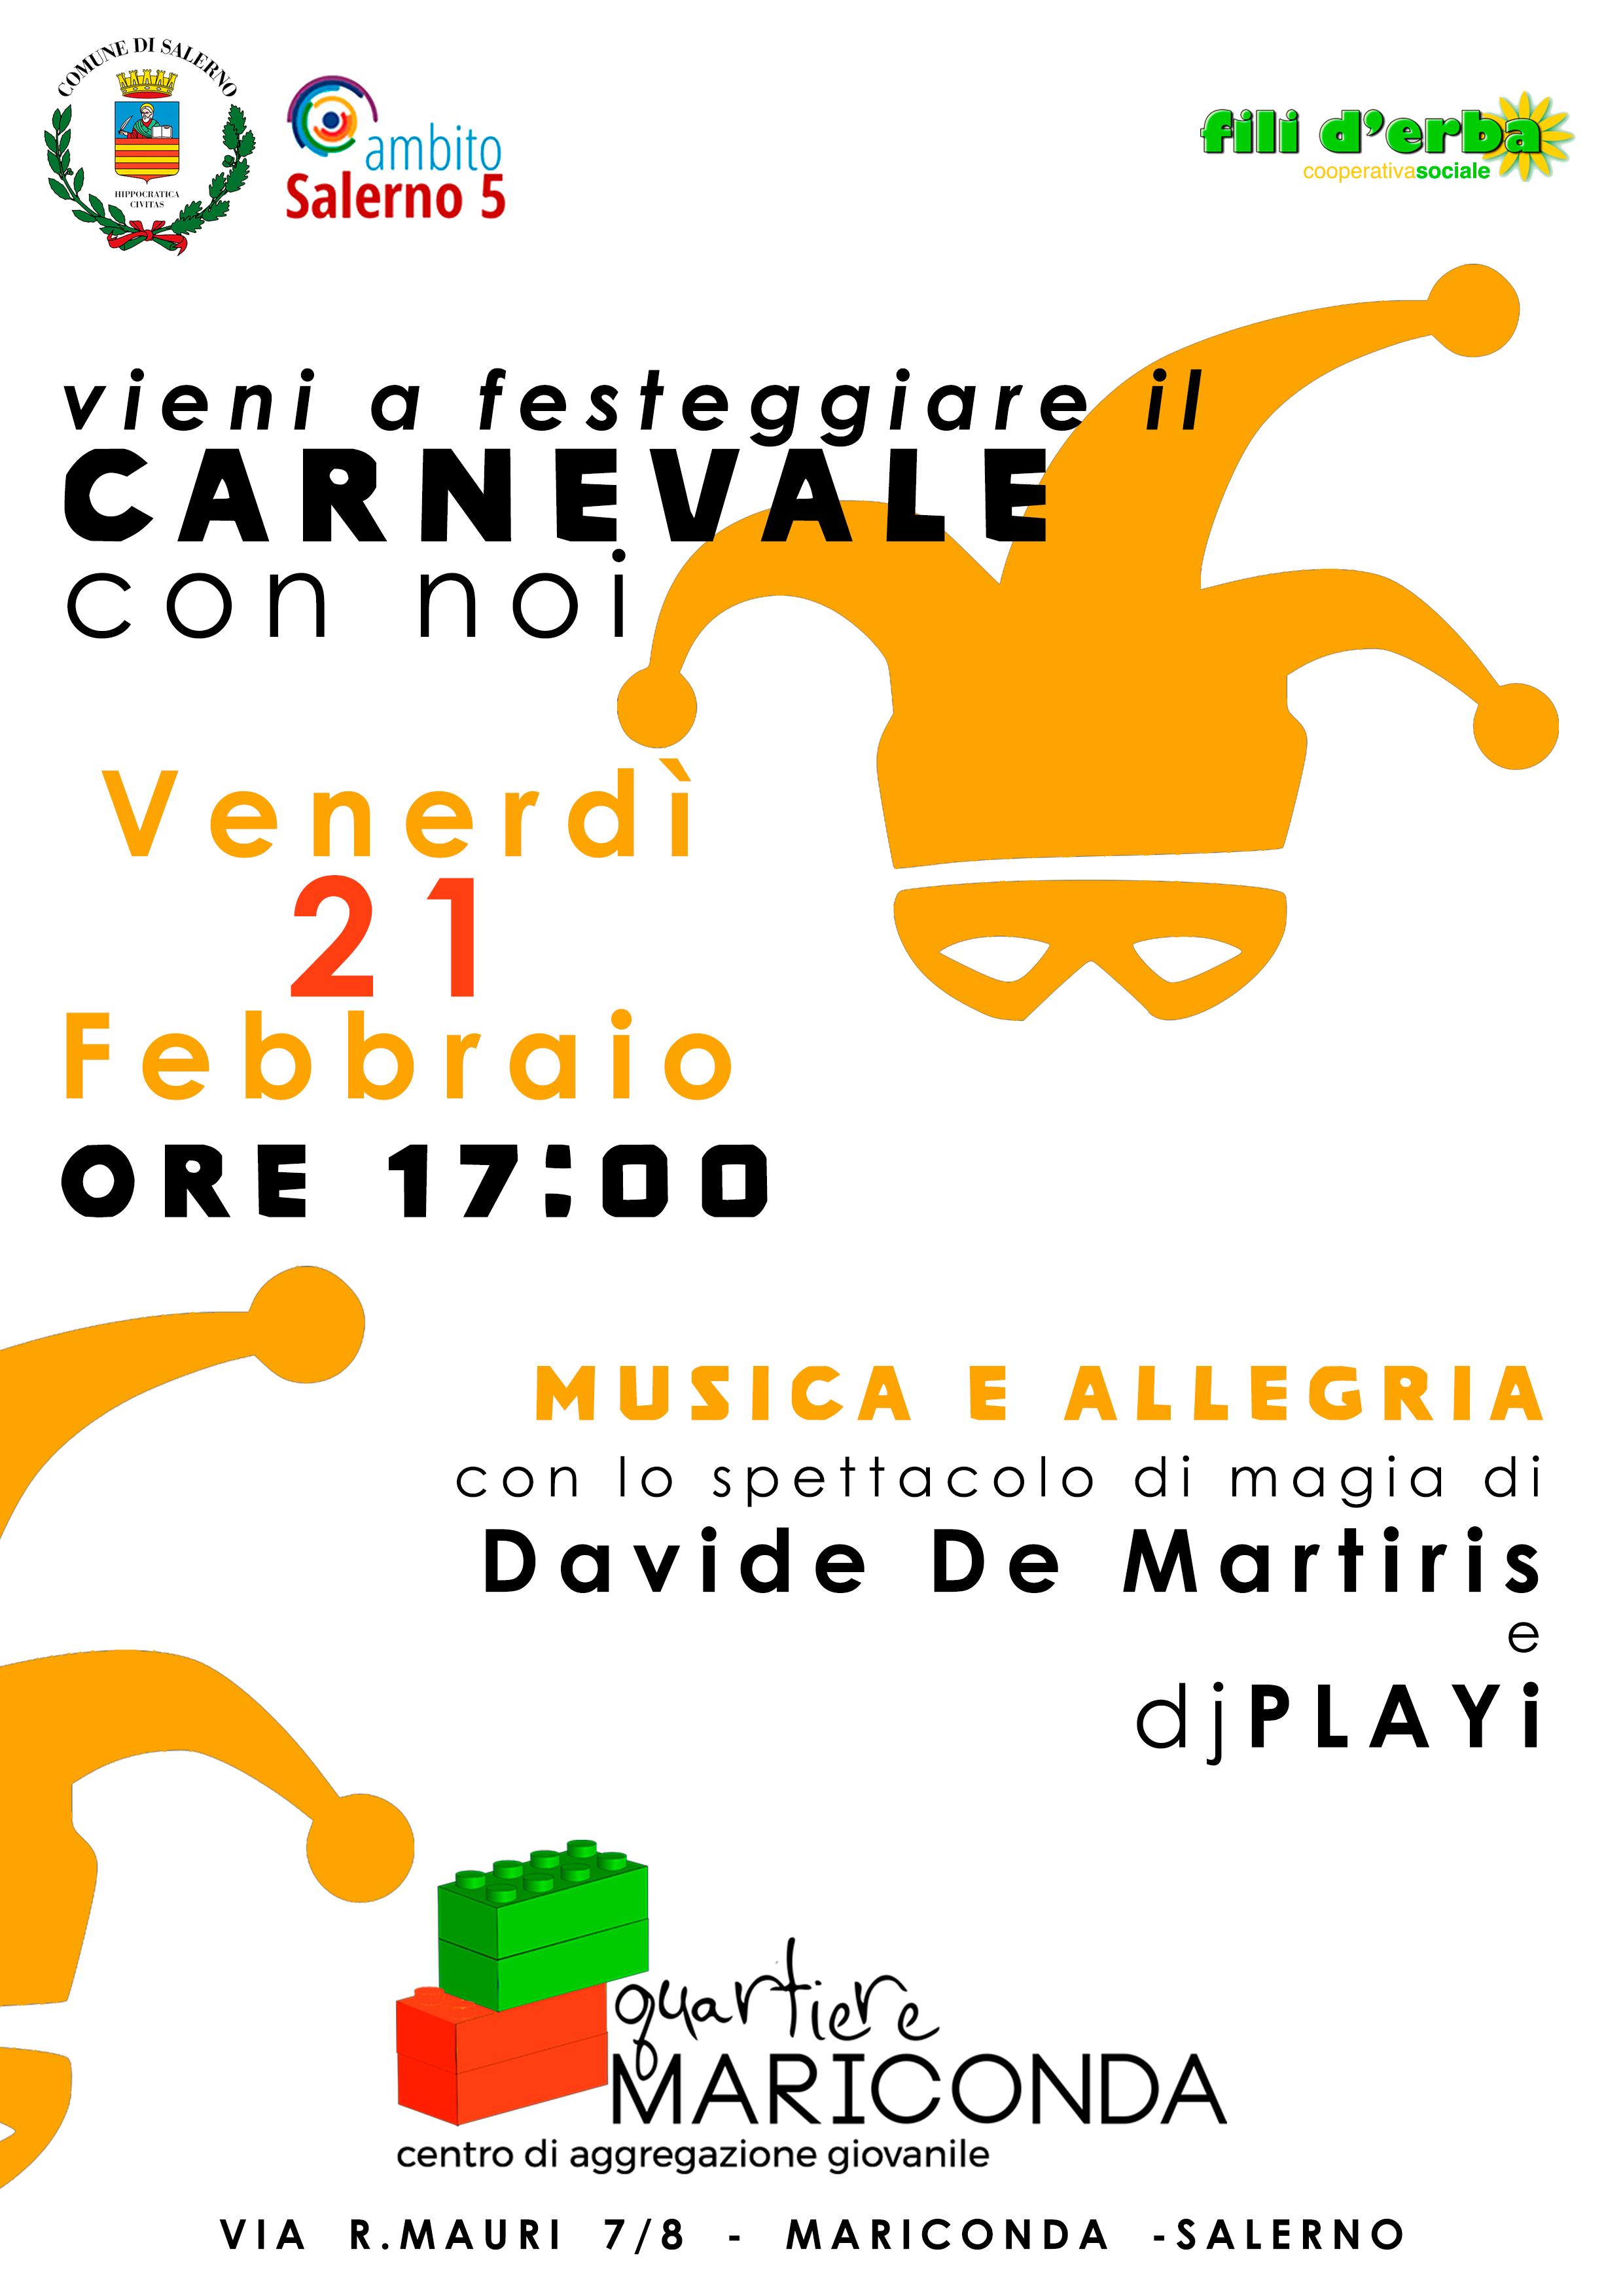 https://www.salernocitta.com/wp-content/uploads/2020/02/volantino-carnevale-2020.png